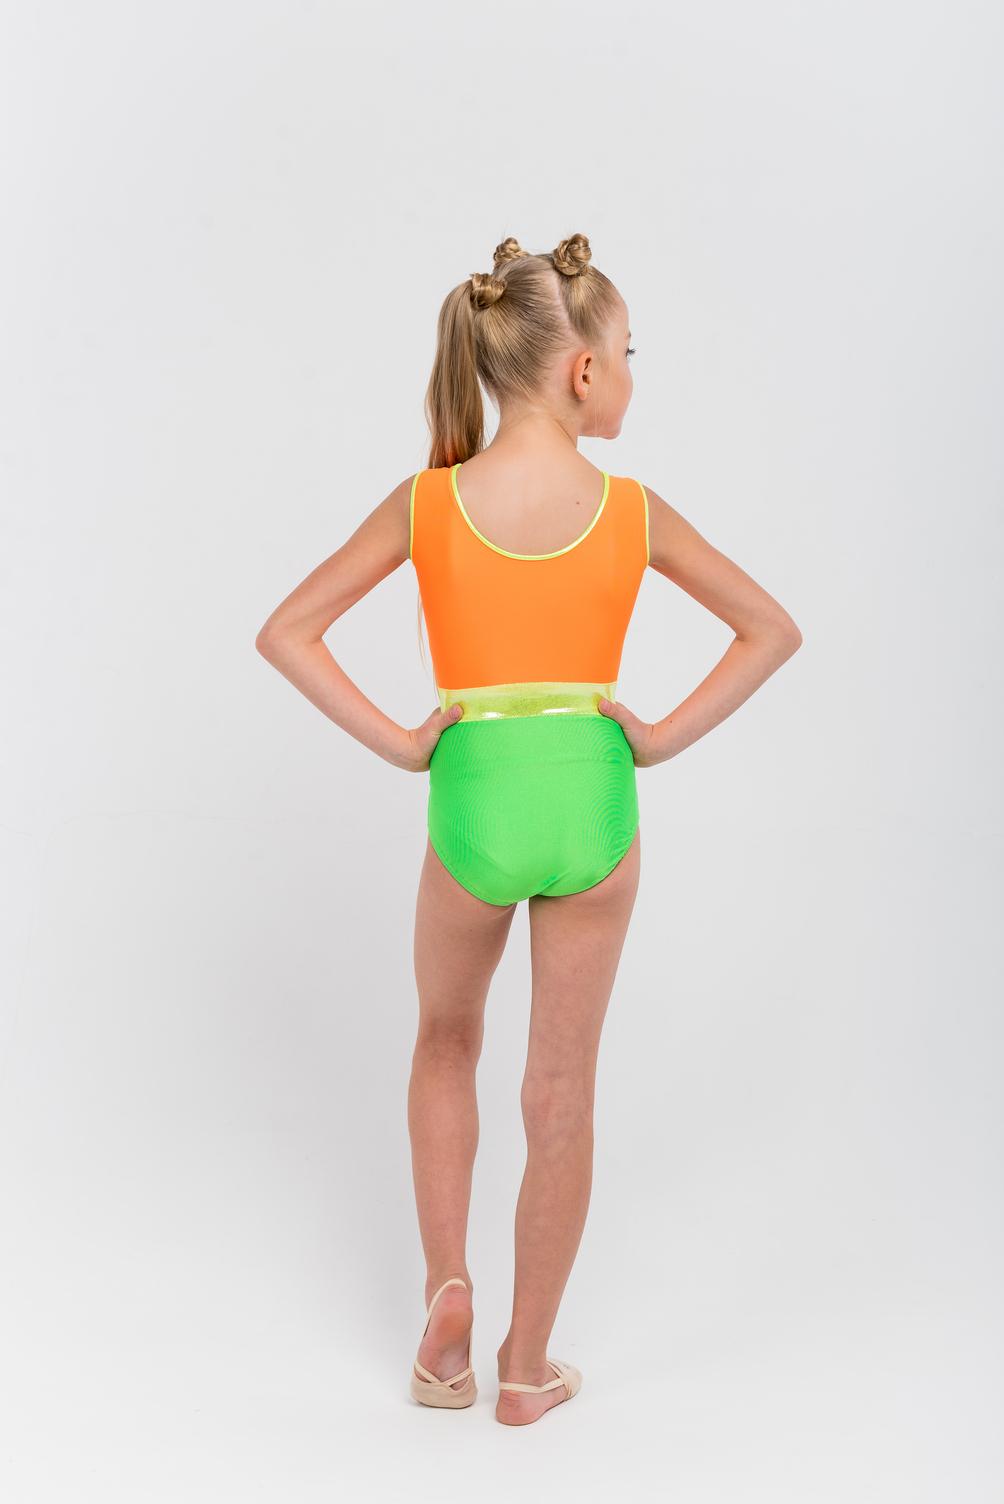 Workout Leotards, Orange Summer, pic 3